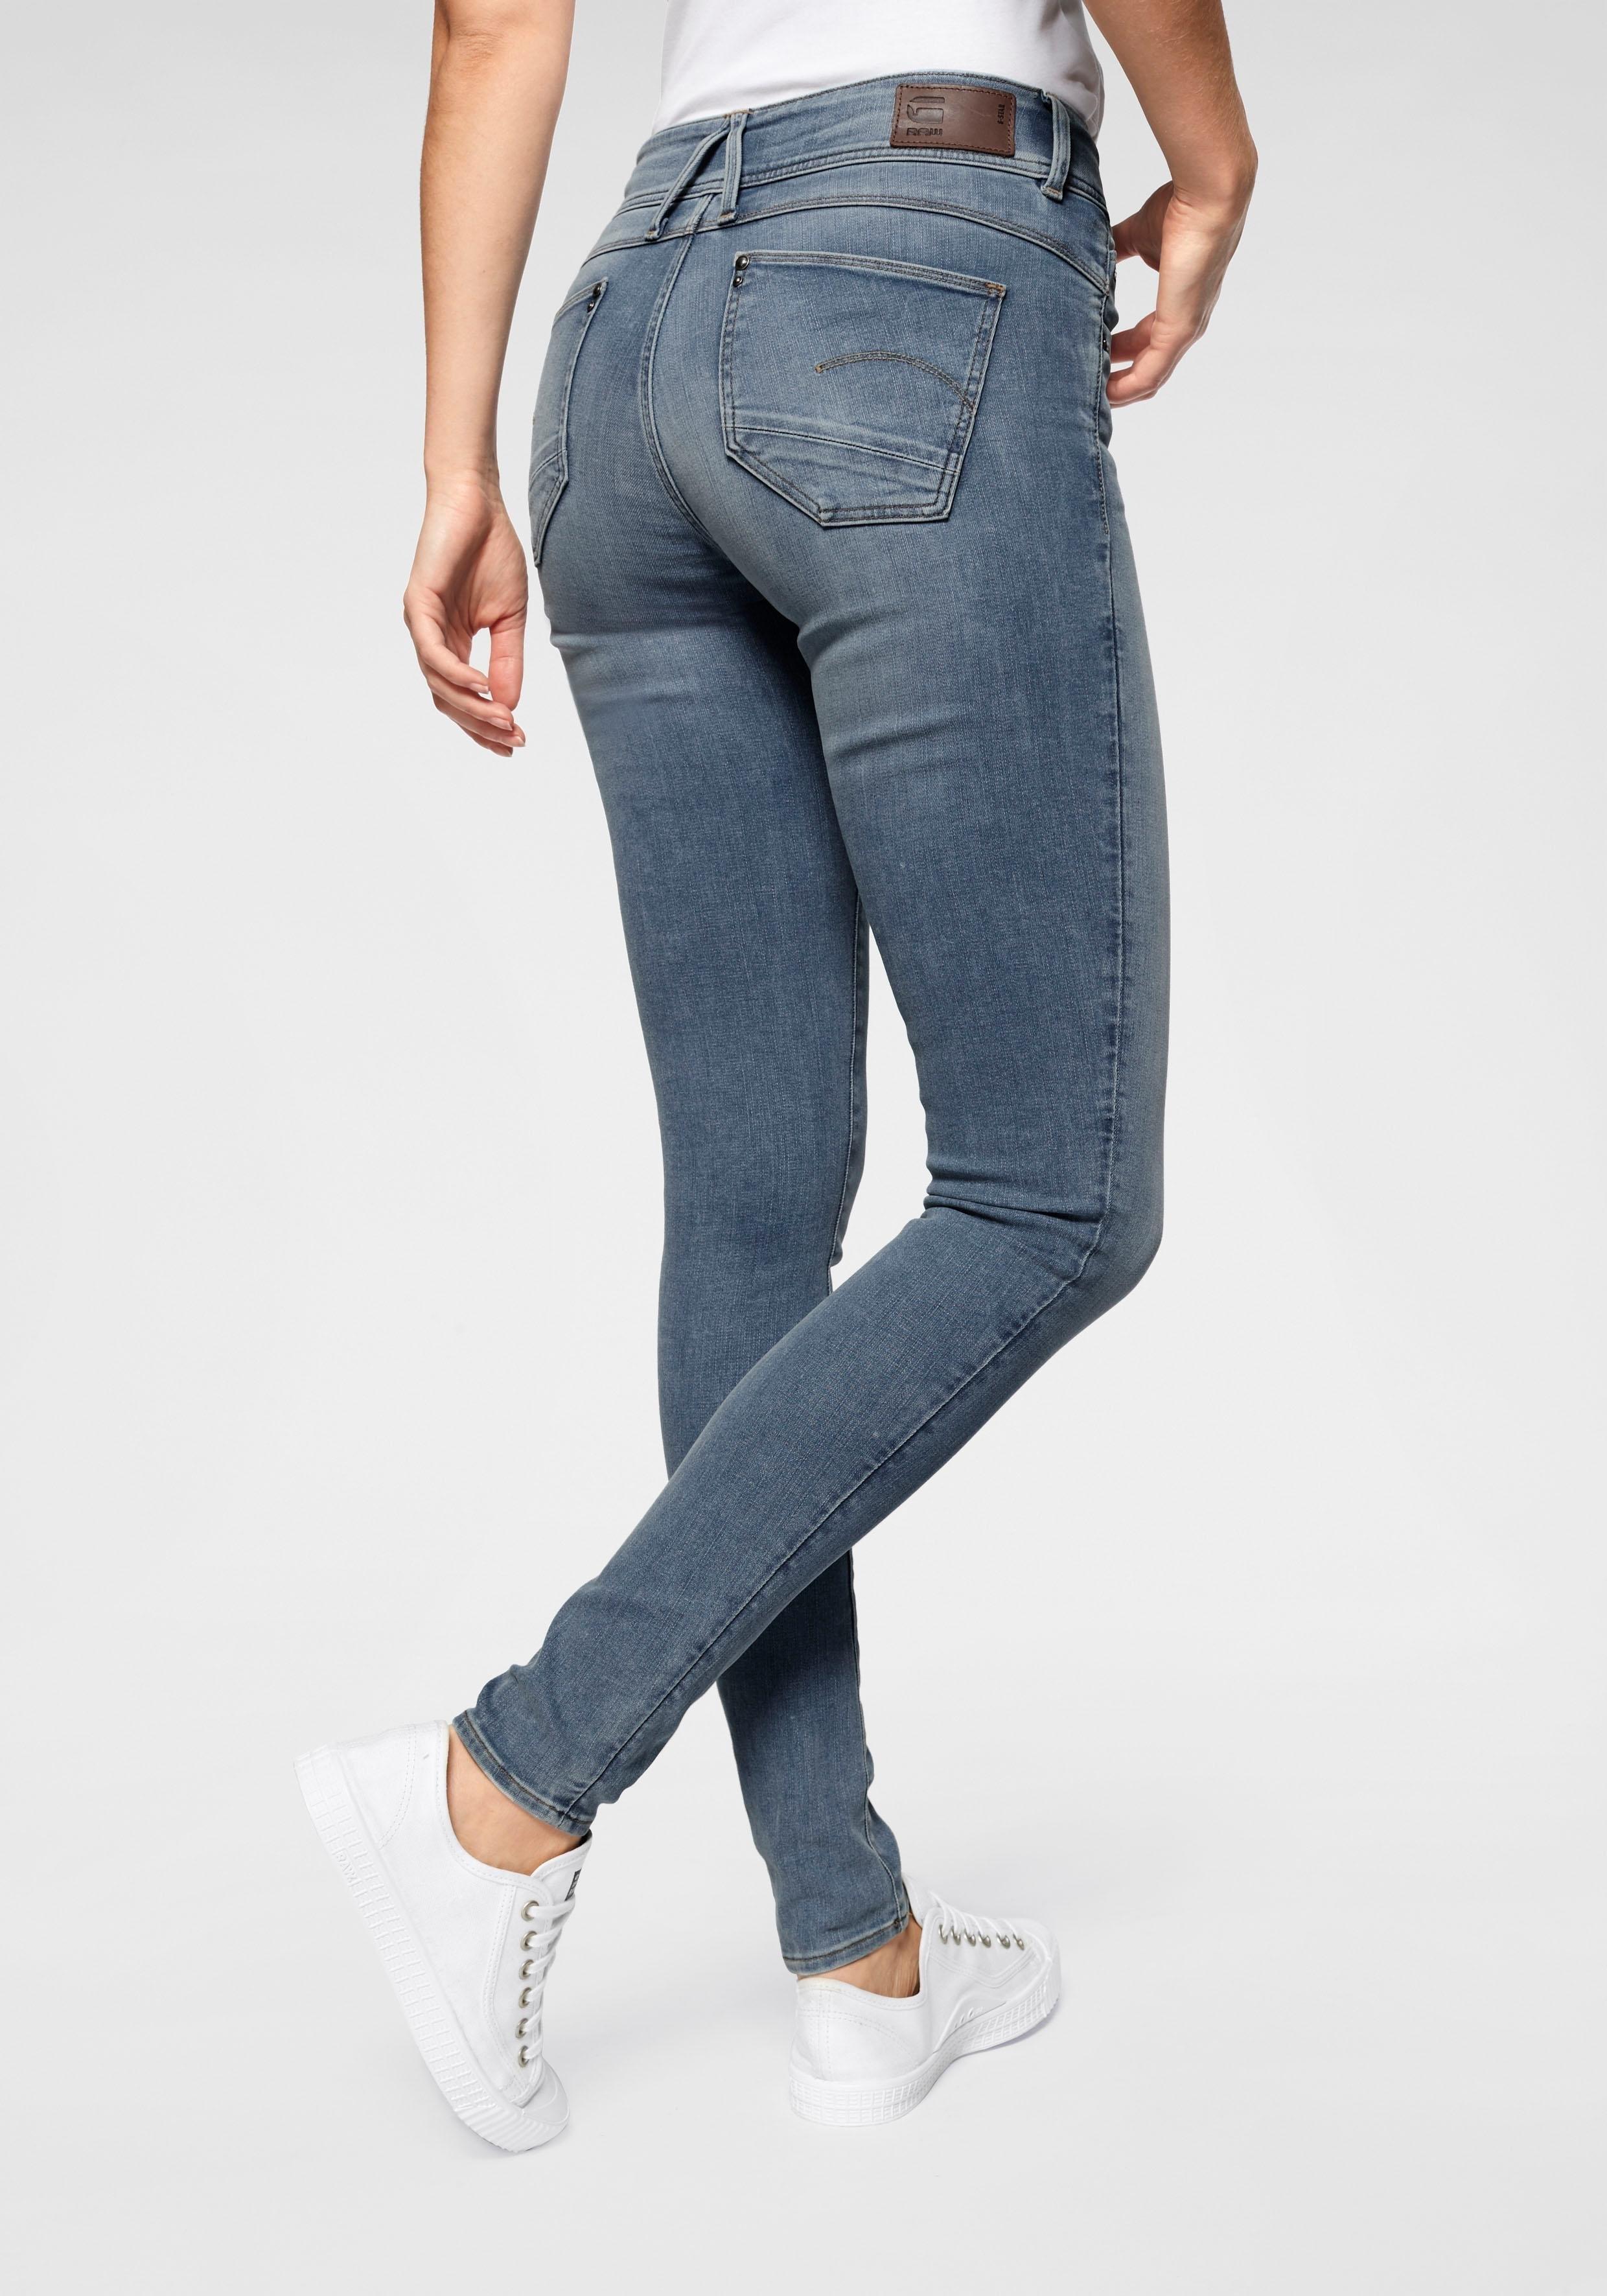 G-star Raw 5-pocket jeans »Lynn High Super Skinny Wmn« bestellen: 14 dagen bedenktijd